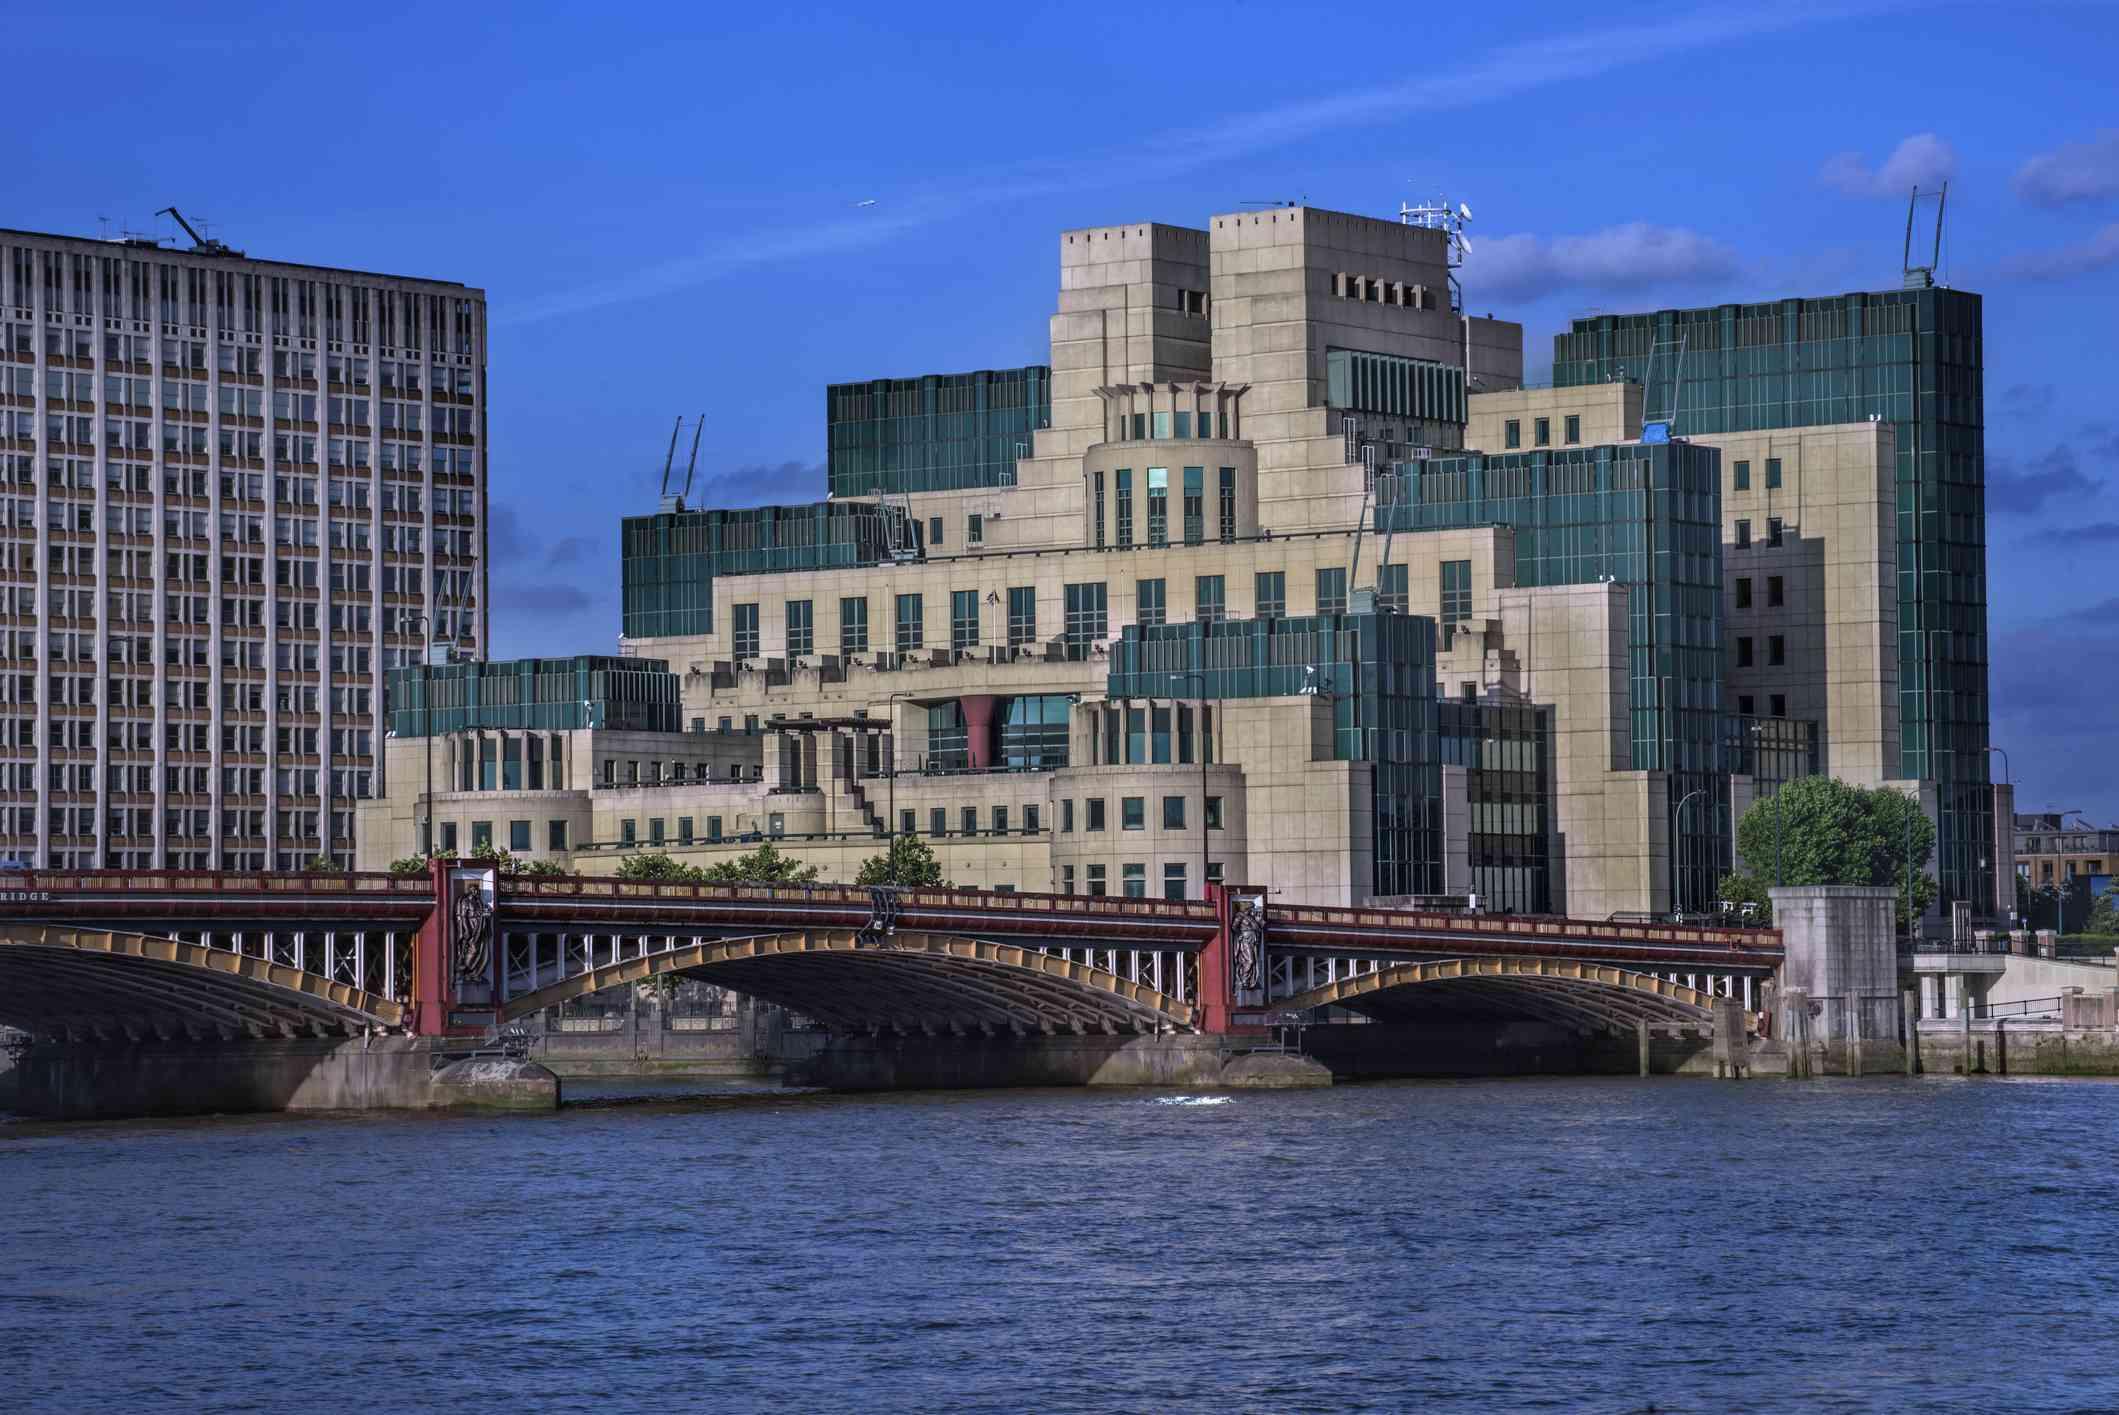 MI5 building in London